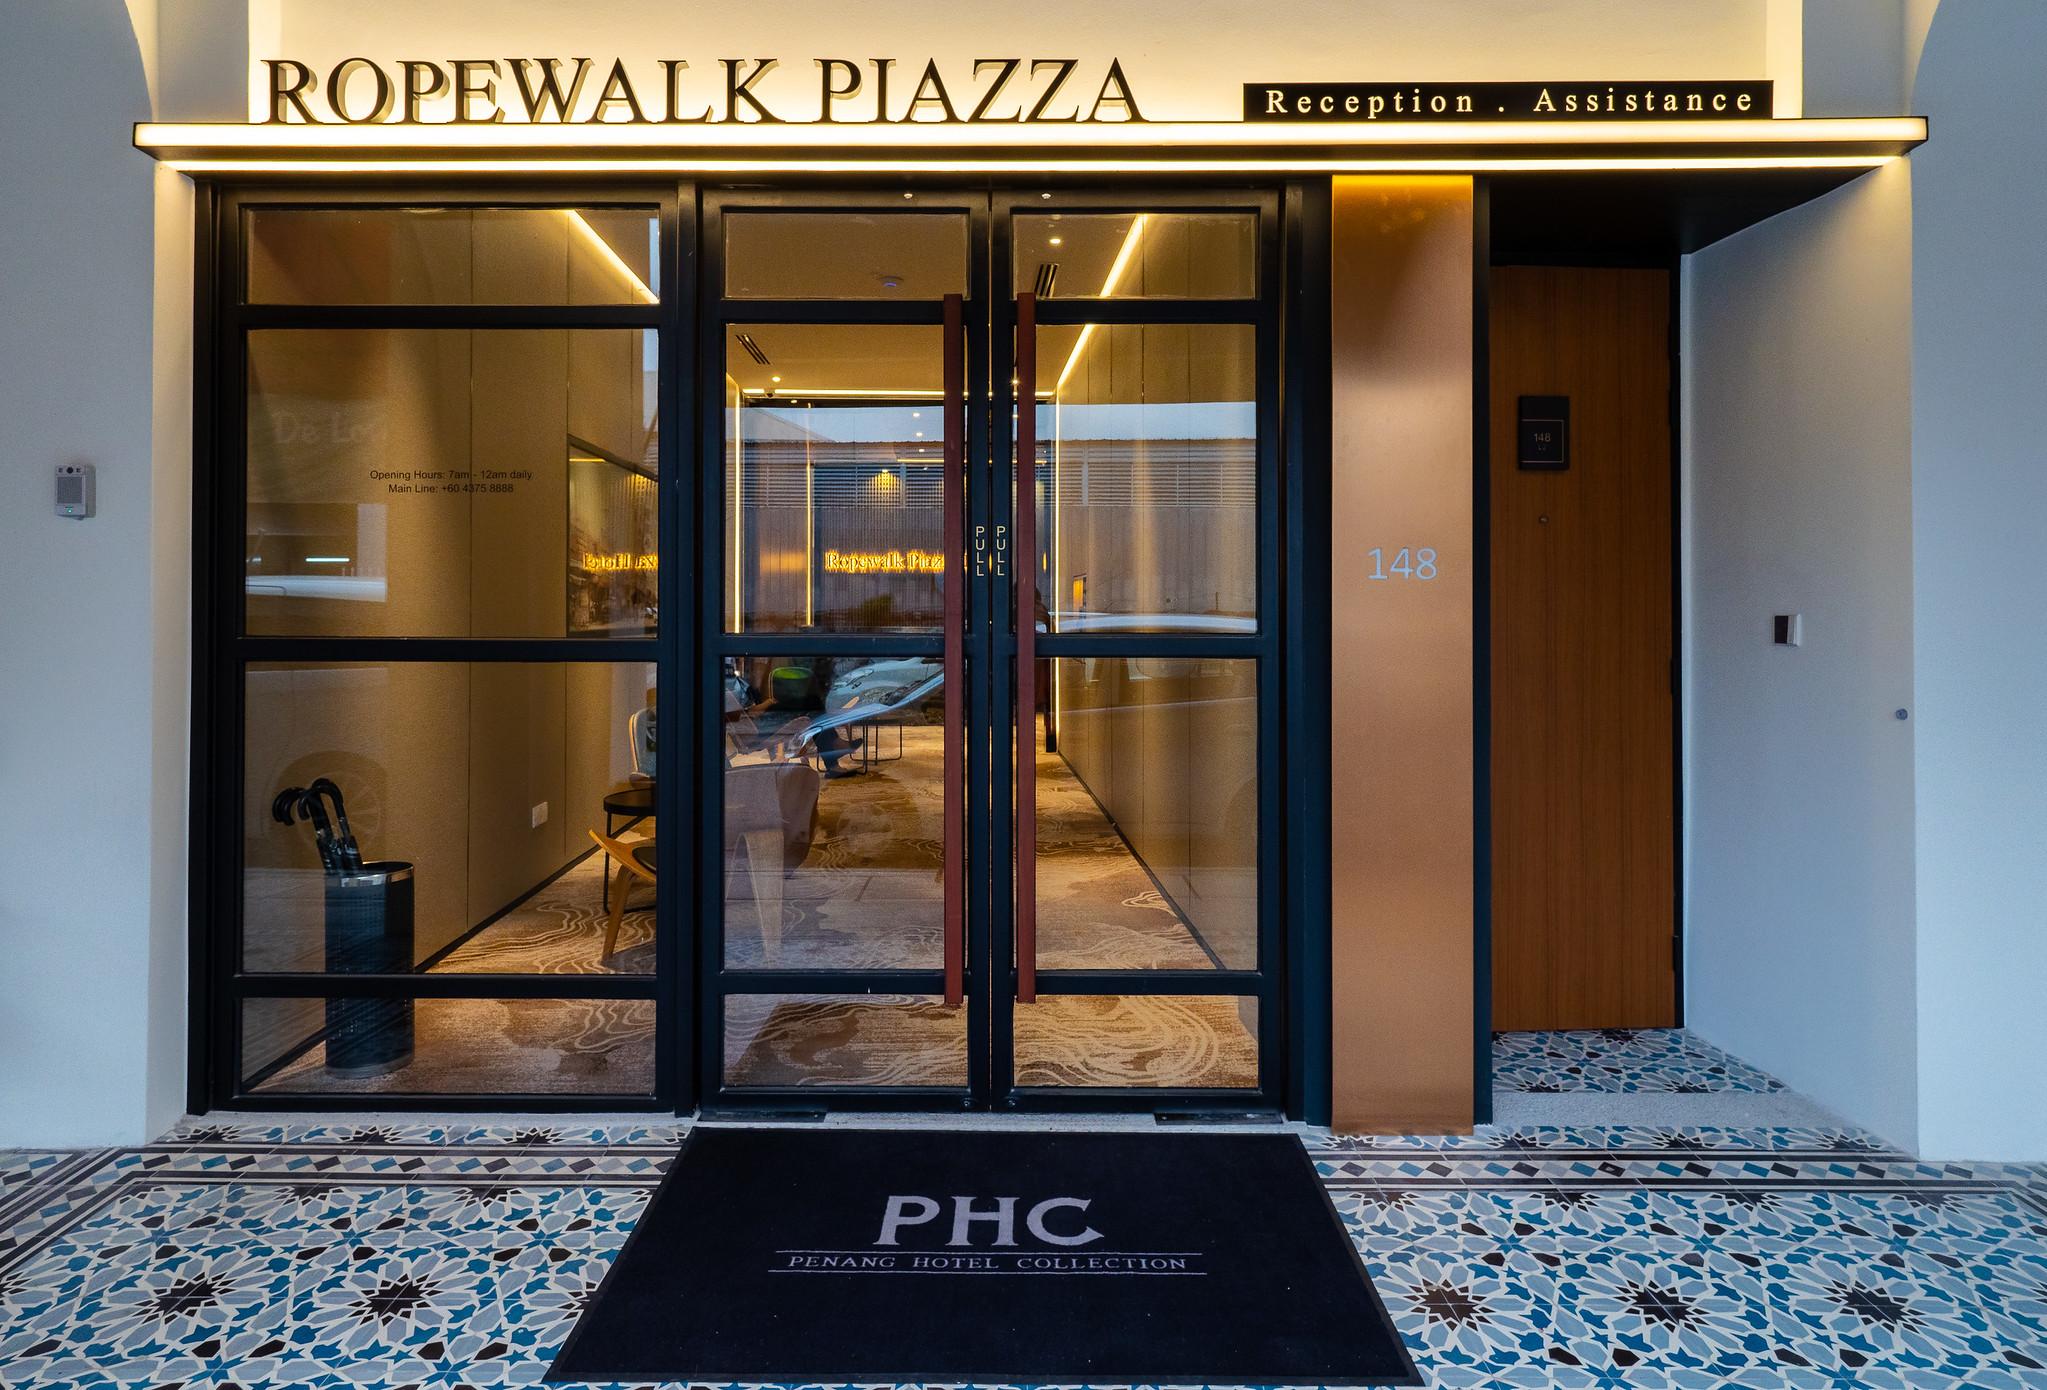 Ropewalk Piazza Hotel Lobby Front